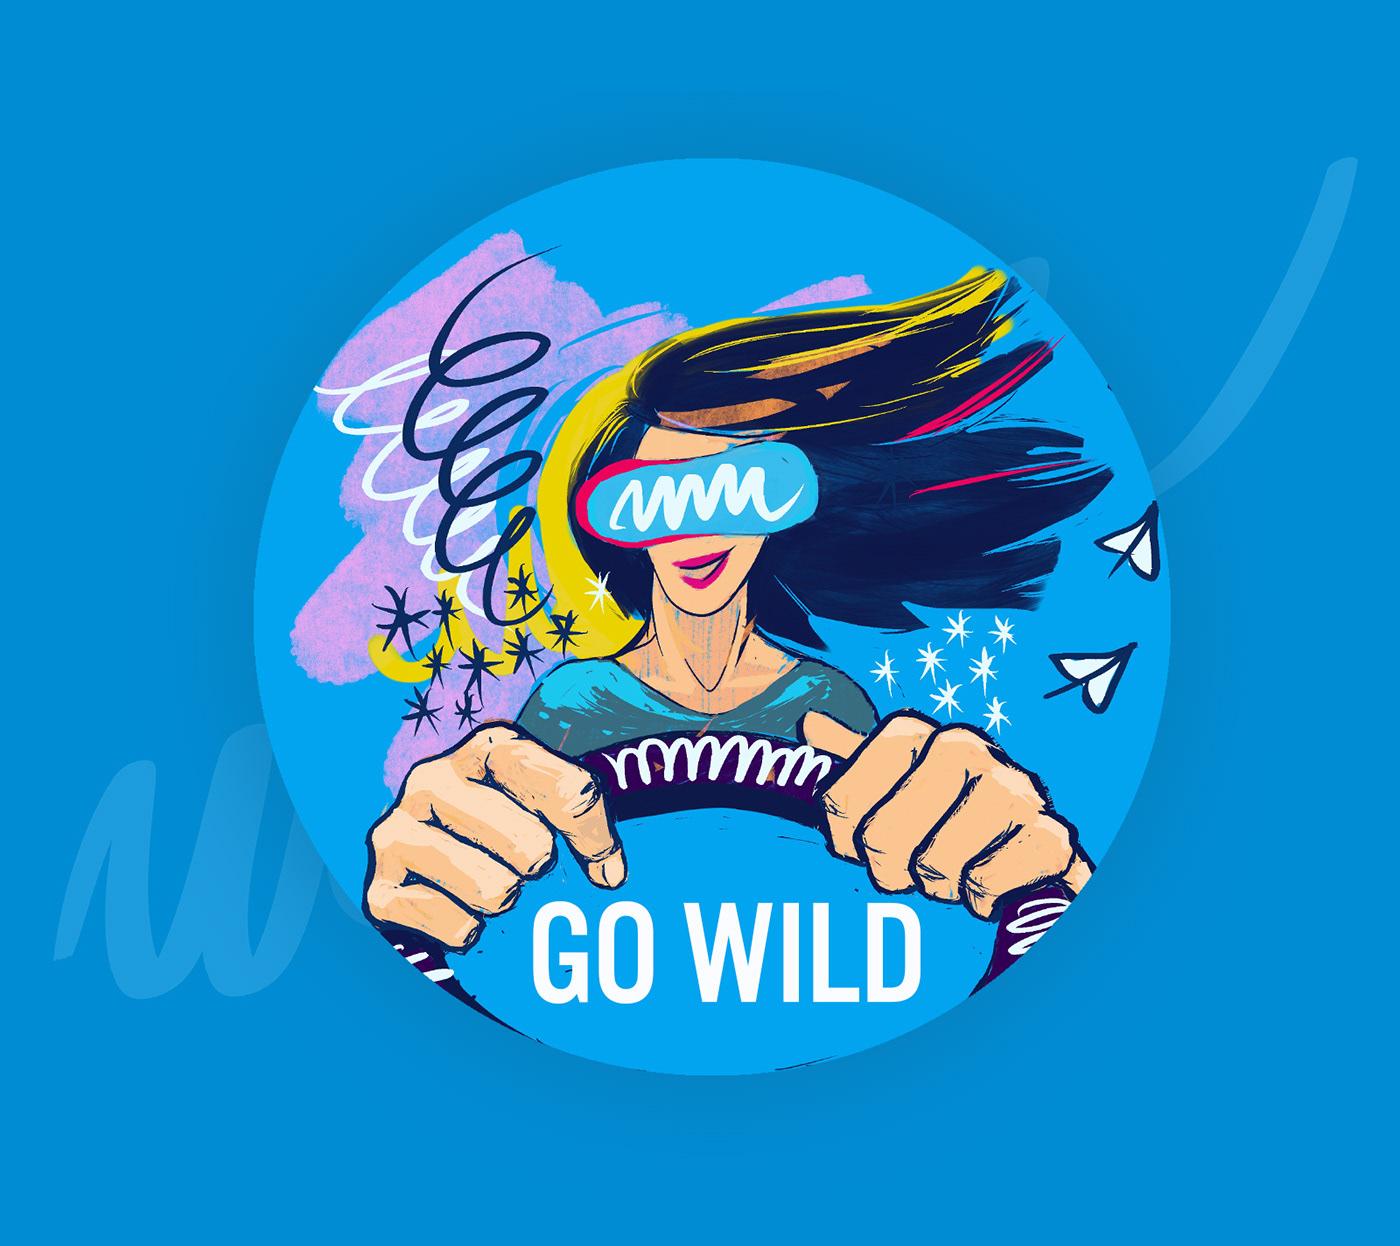 ILLUSTRATION ,Driving,vr,Virtual reality,cartoon,wild,Digital Art ,Electric Car,sticker,Playful